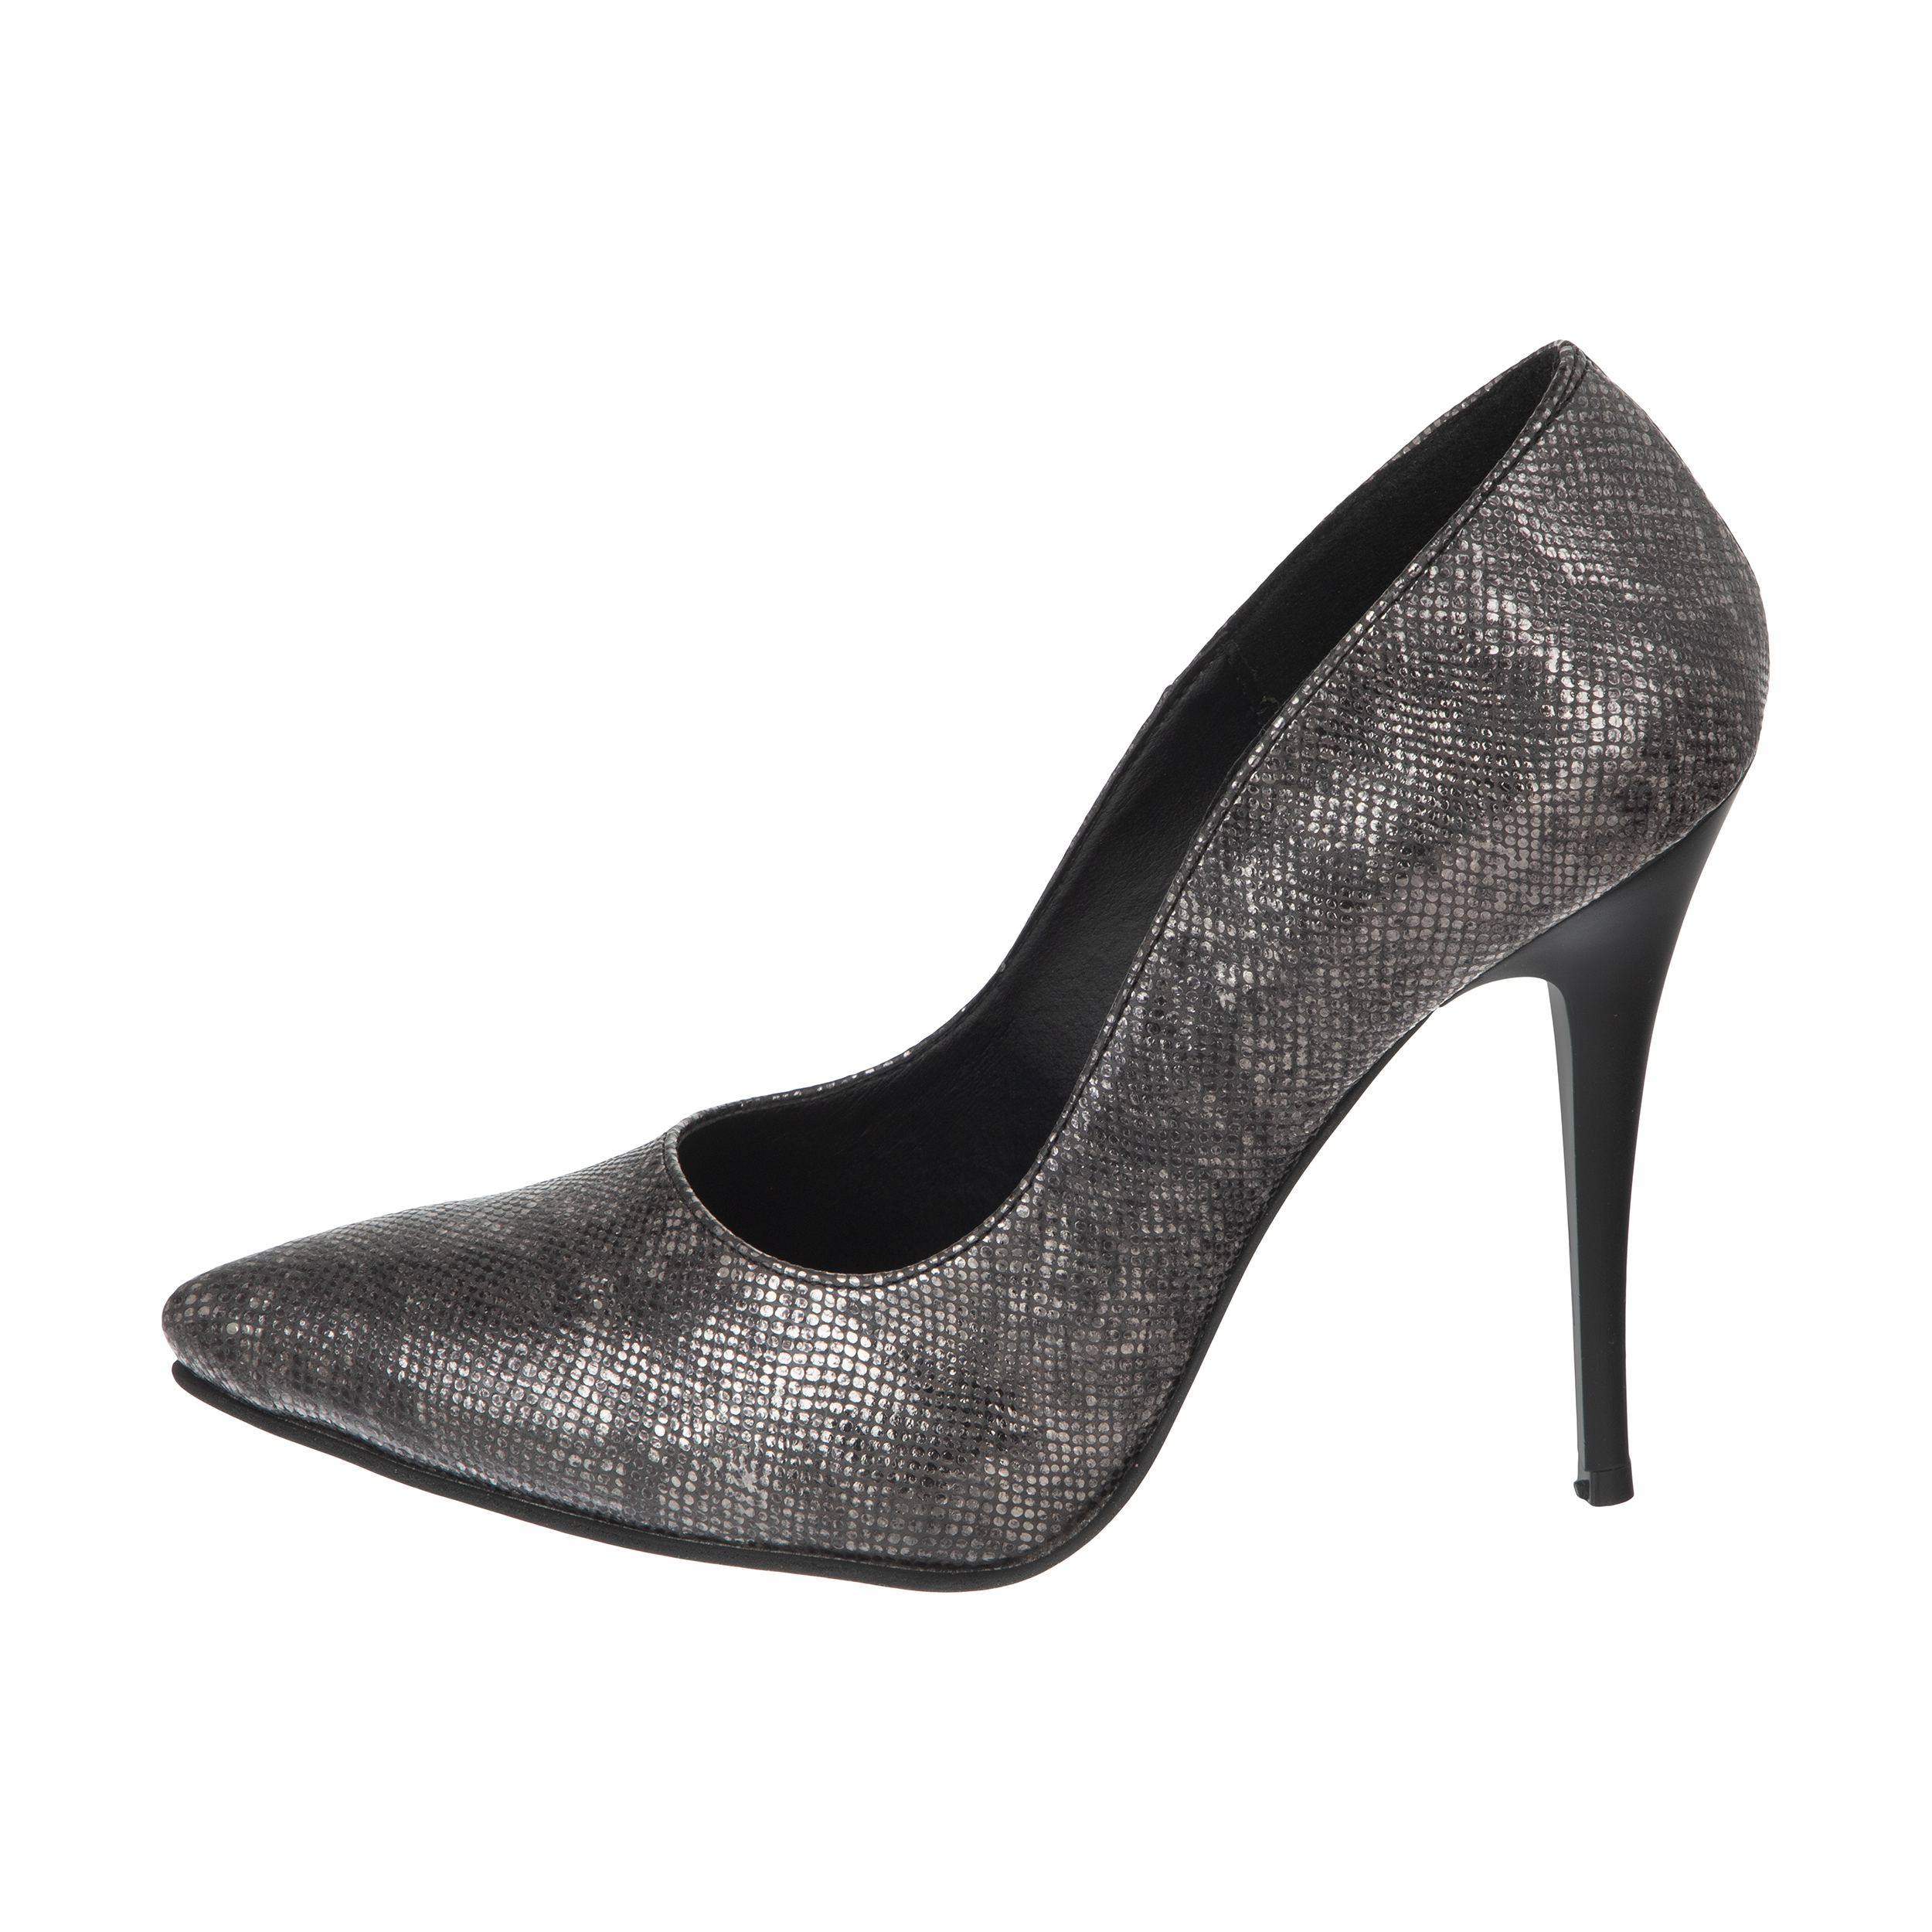 کفش زنانه ادورا کد 0672111